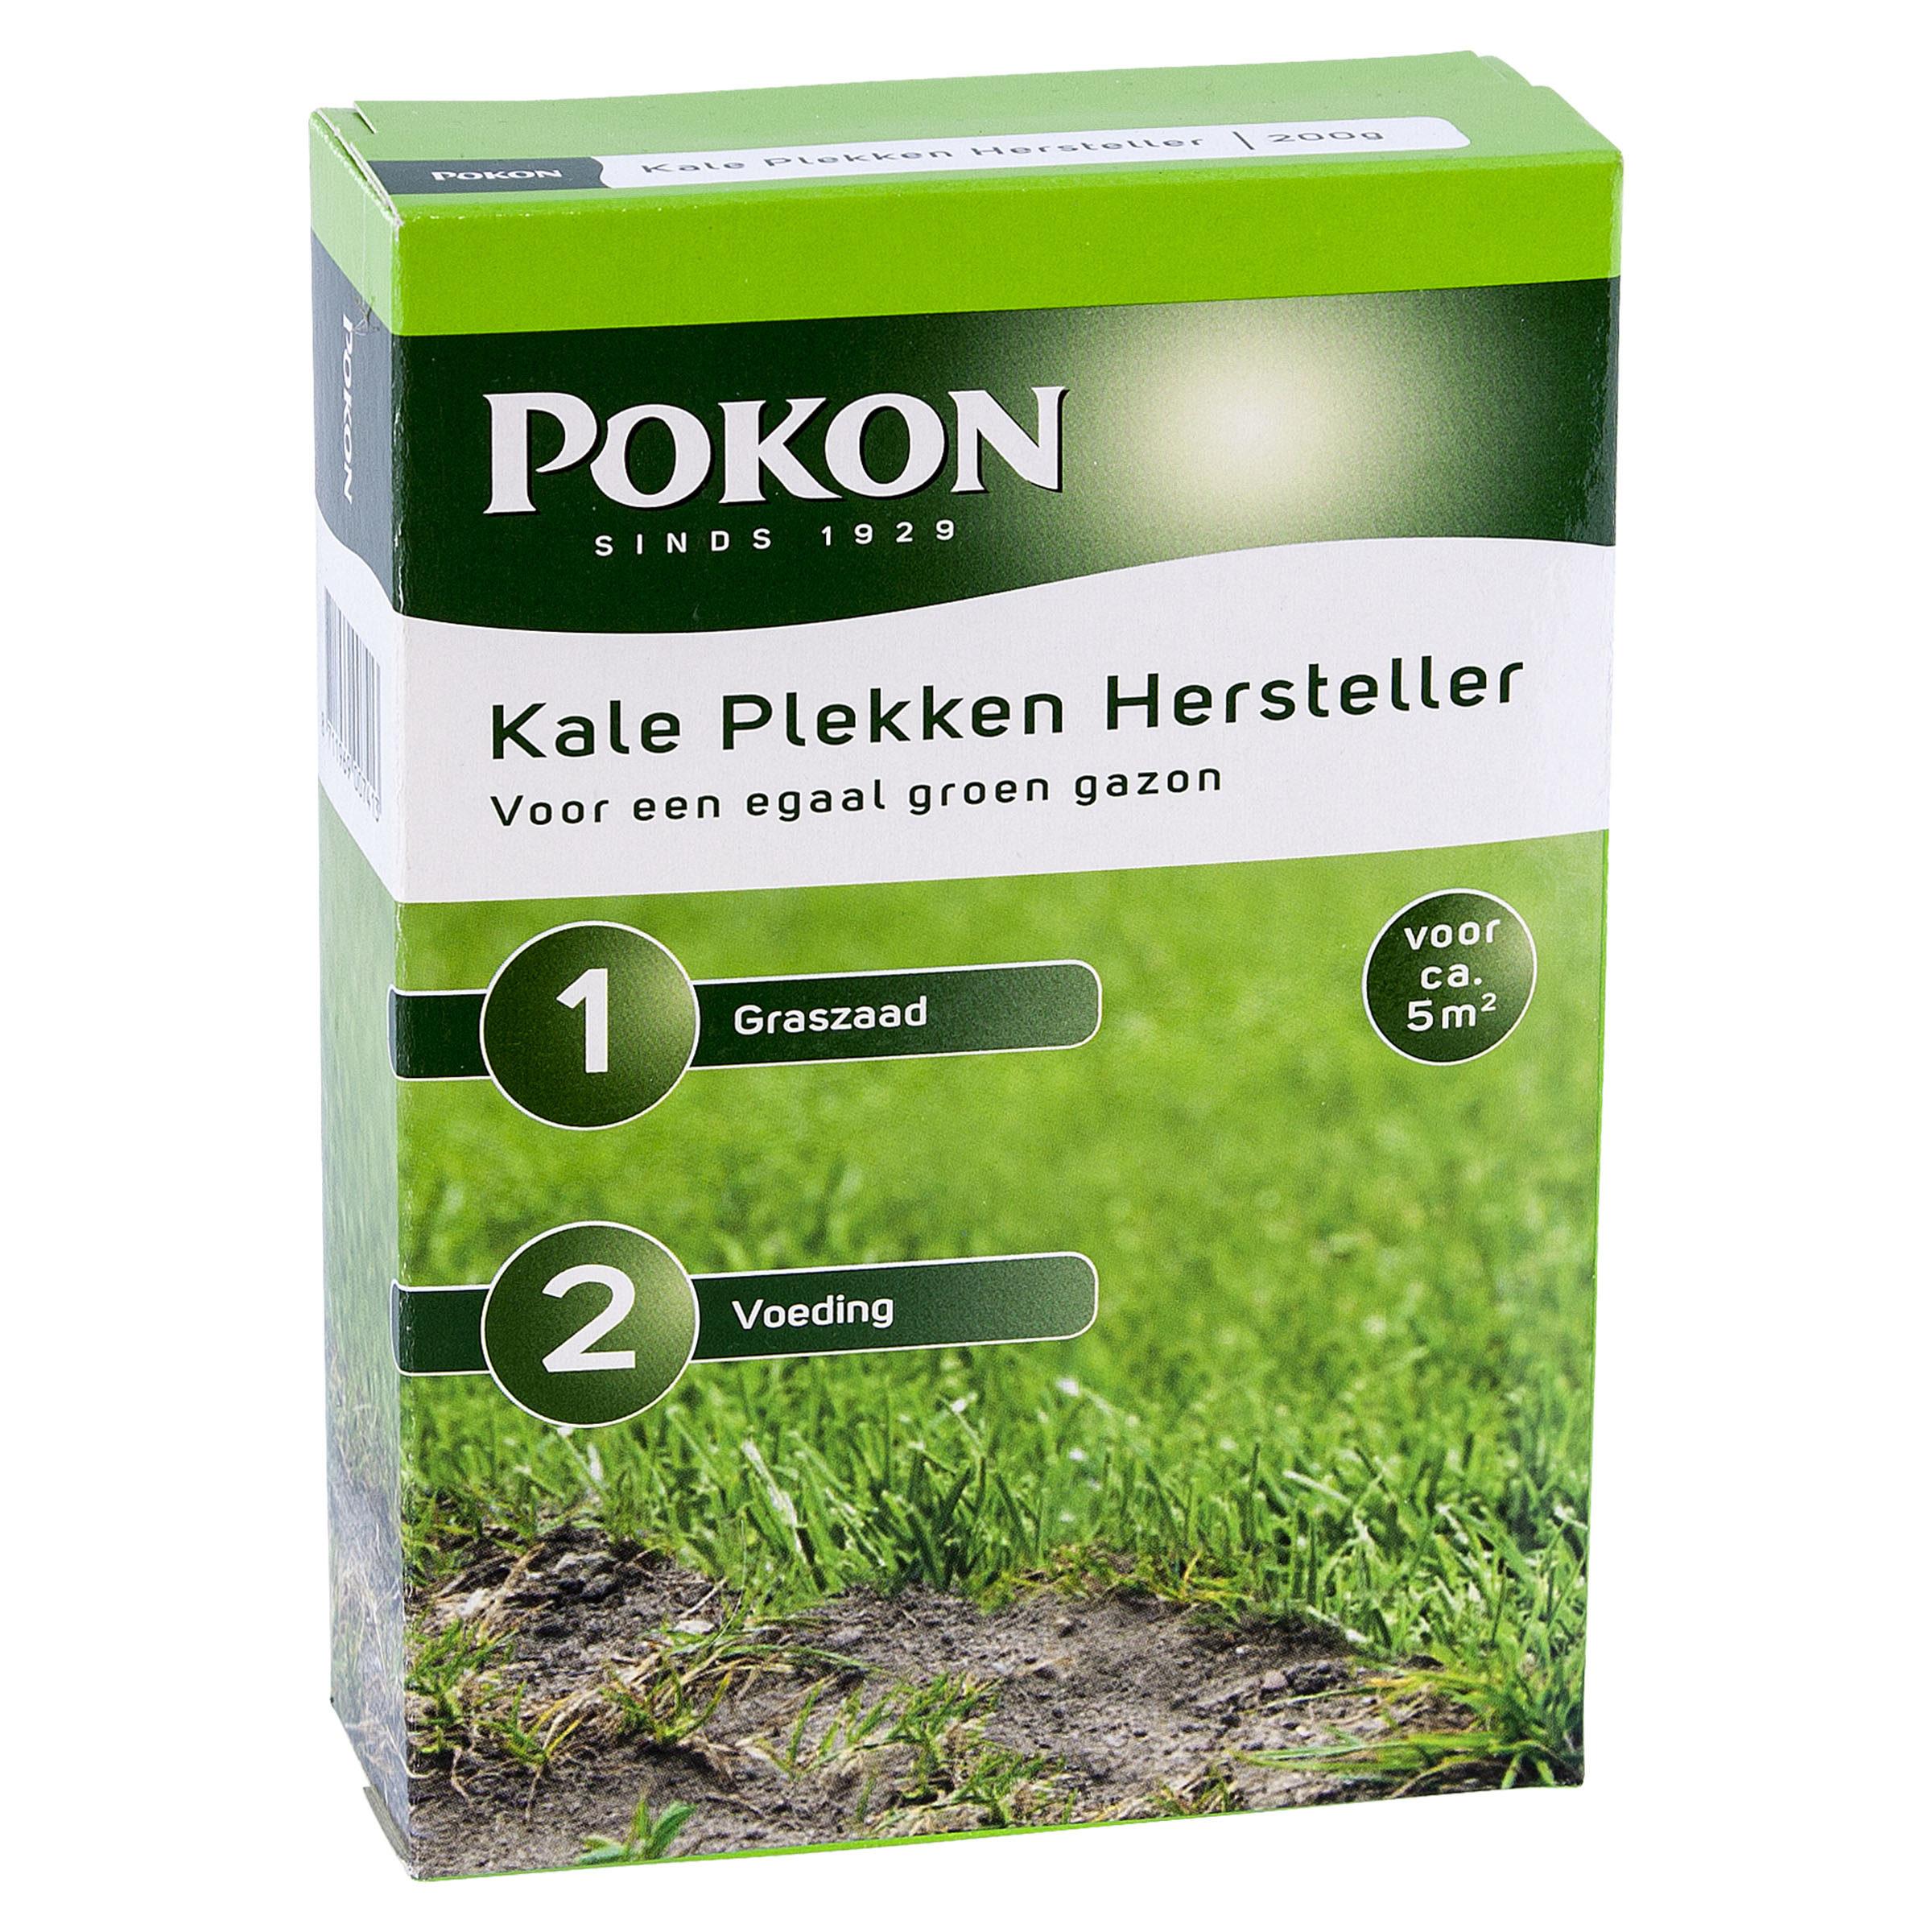 Pokon Kale Plekken Hersteller 200gr links